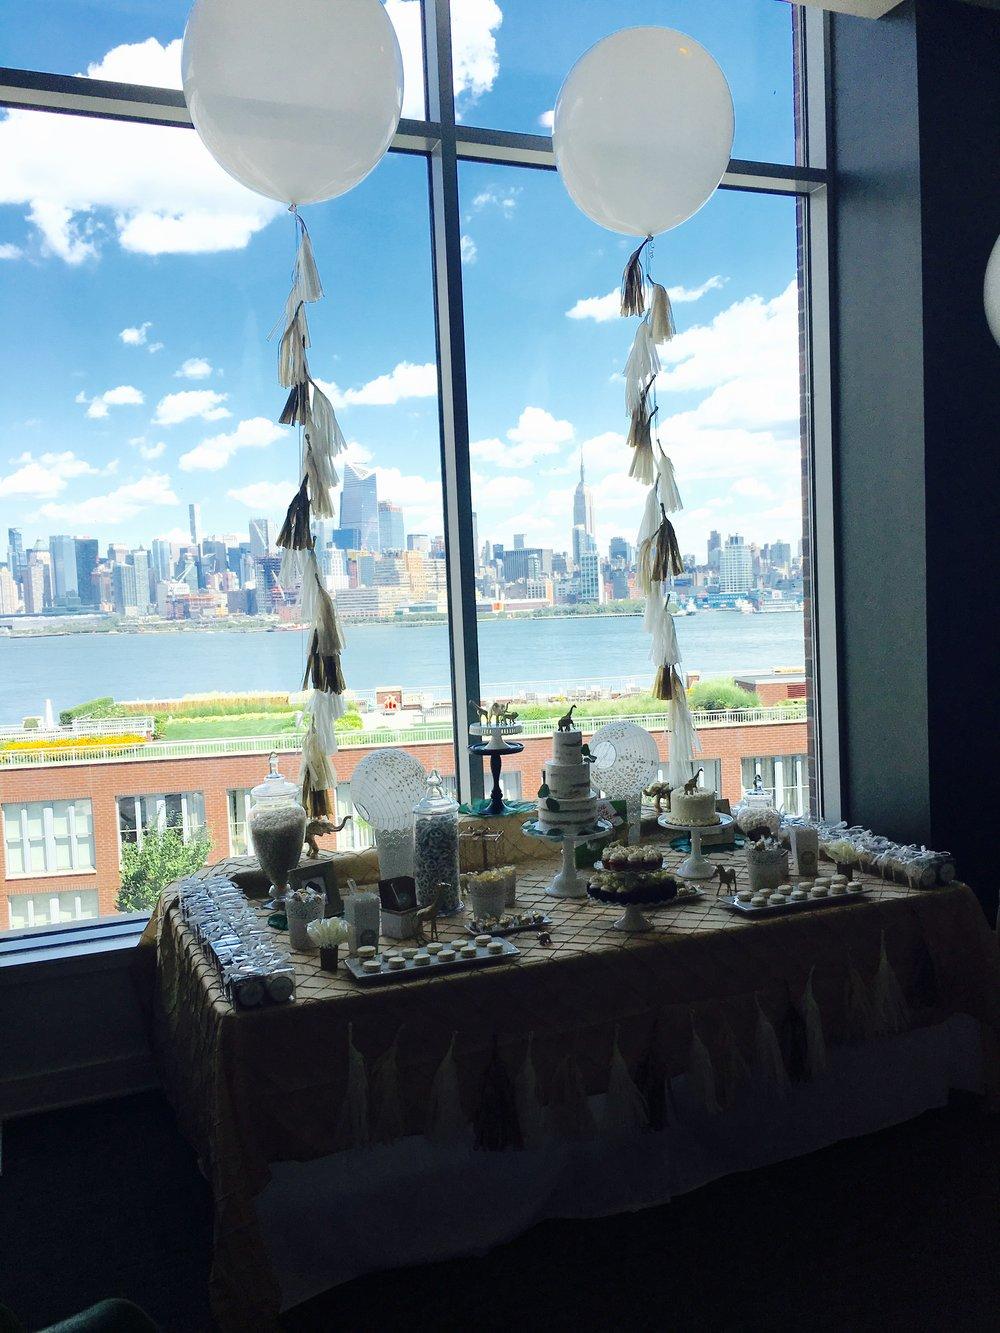 The Sweet Safari dessert table